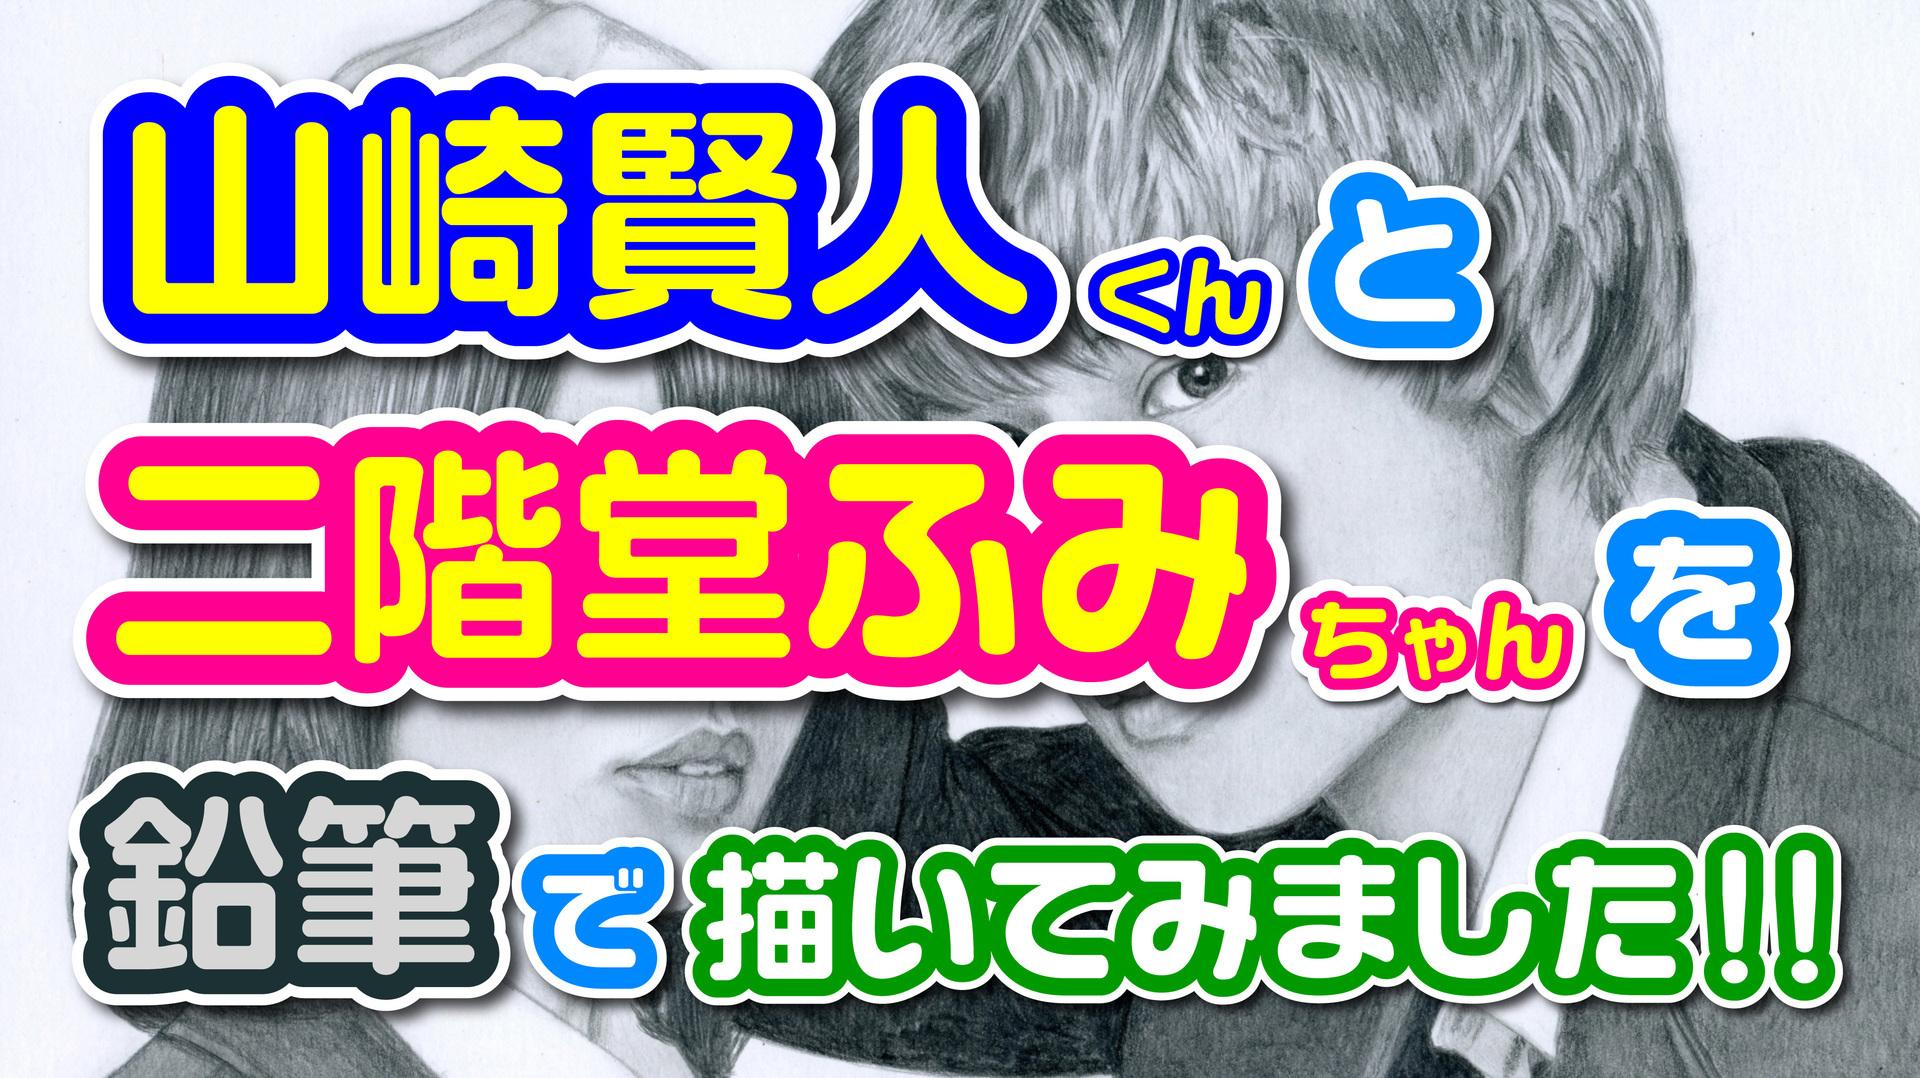 Youtubeサムネイル 山崎賢人・二階堂ふみ鉛筆画2.jpg